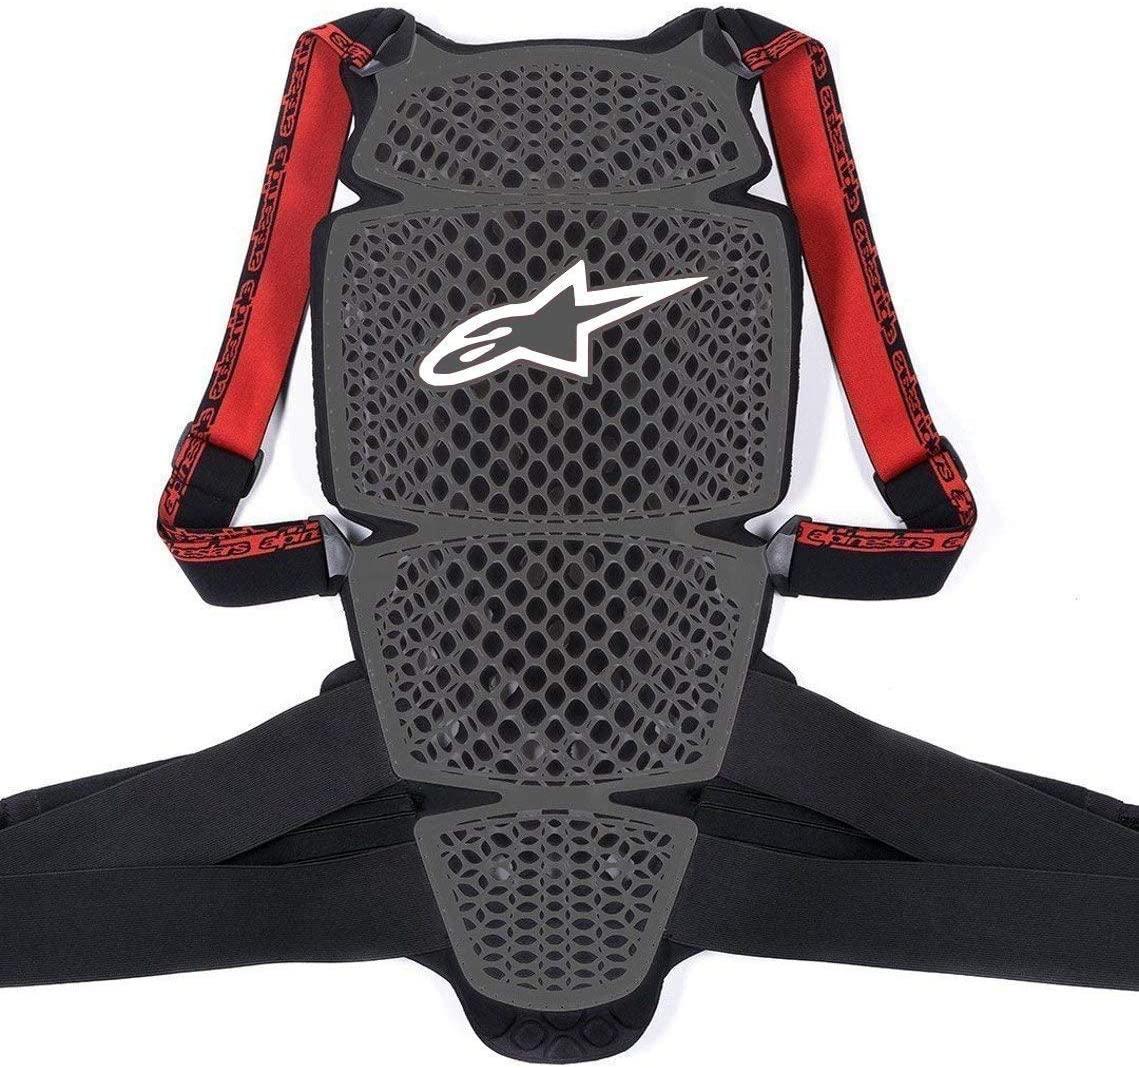 Alpinestars Men's Nucleon KR-Cell Motorcycle Back Protector, Smoke Black/Red, Medium